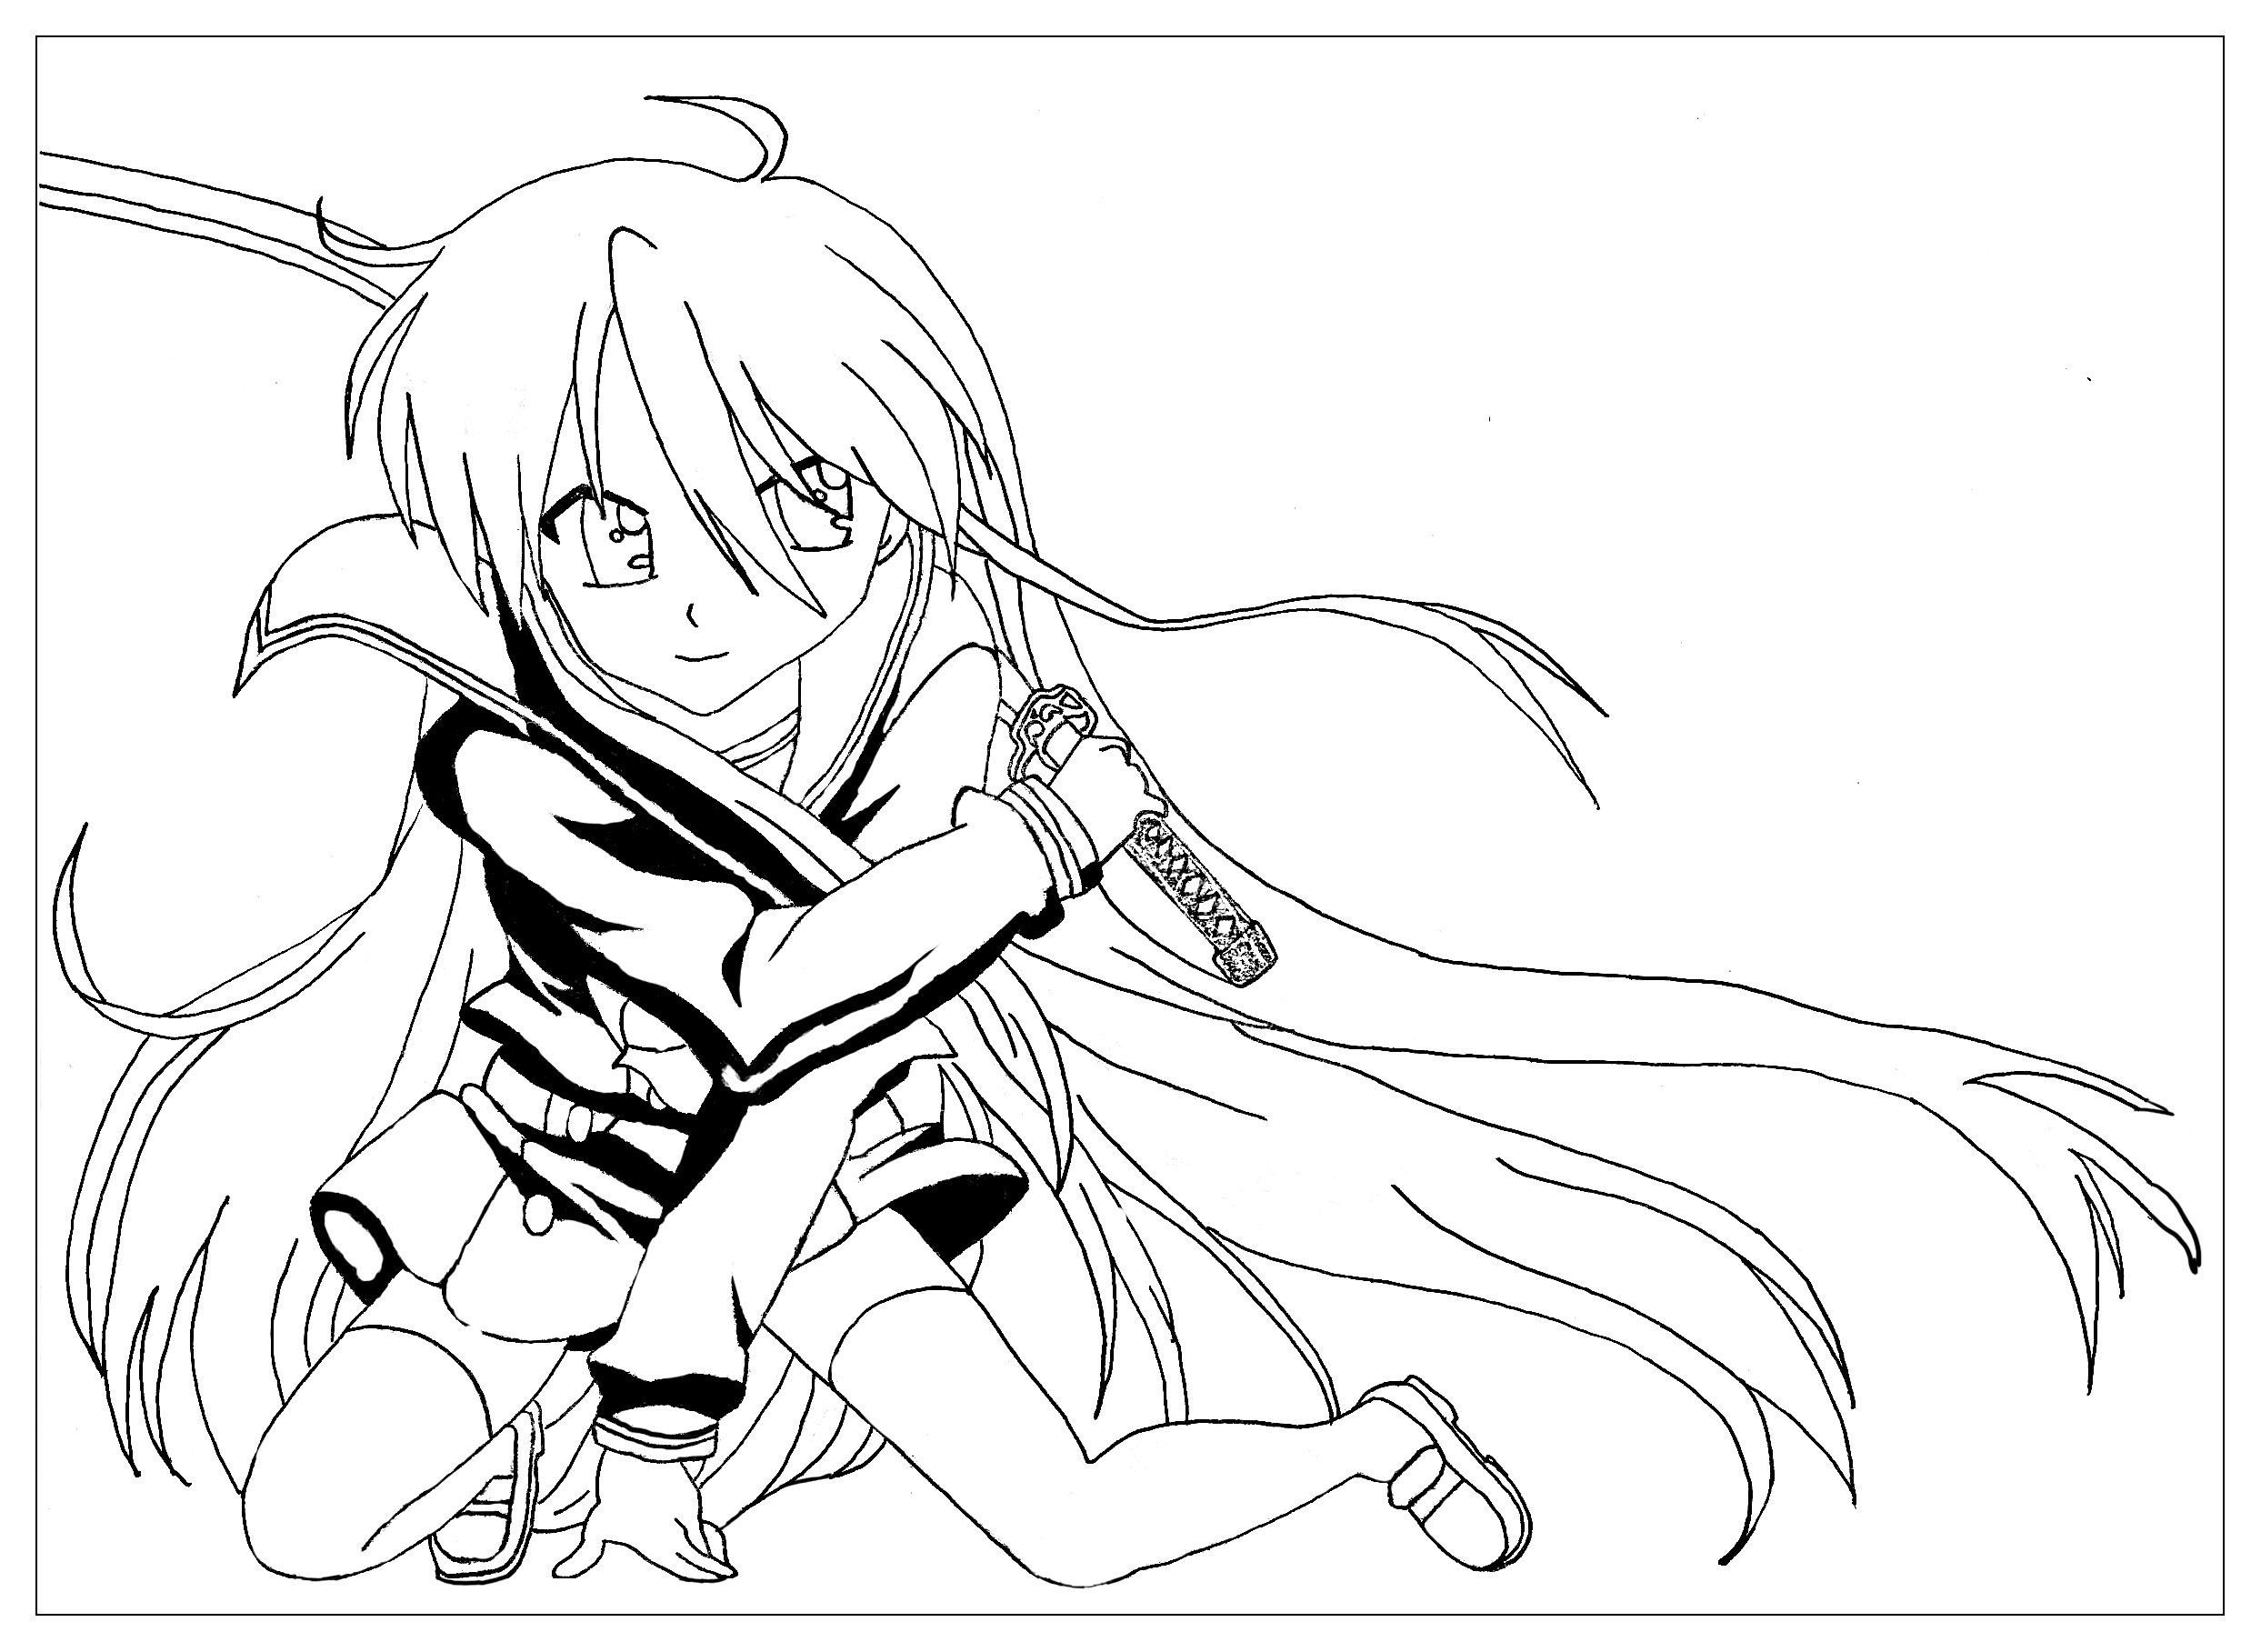 La Fille Au Sabre Style Manga Krissy – Mangas – Coloriages pour Coloriage Manga Kawaii